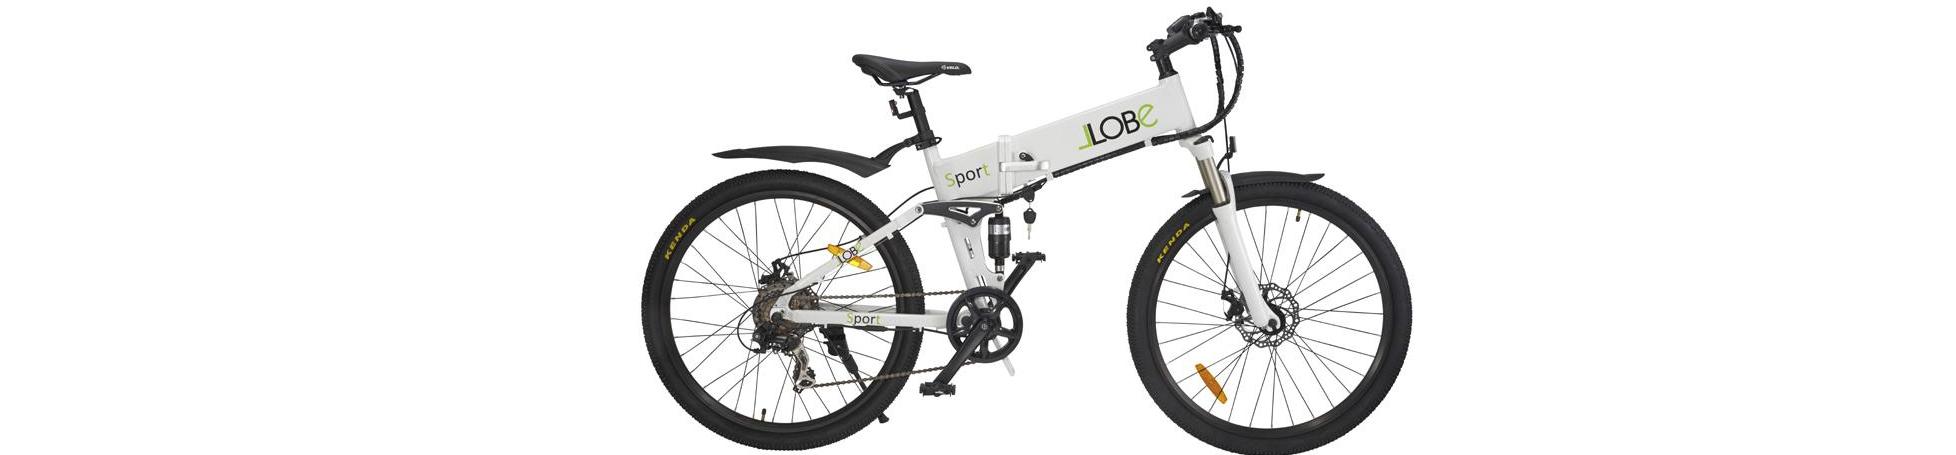 LLOBE Bike - Transvendo